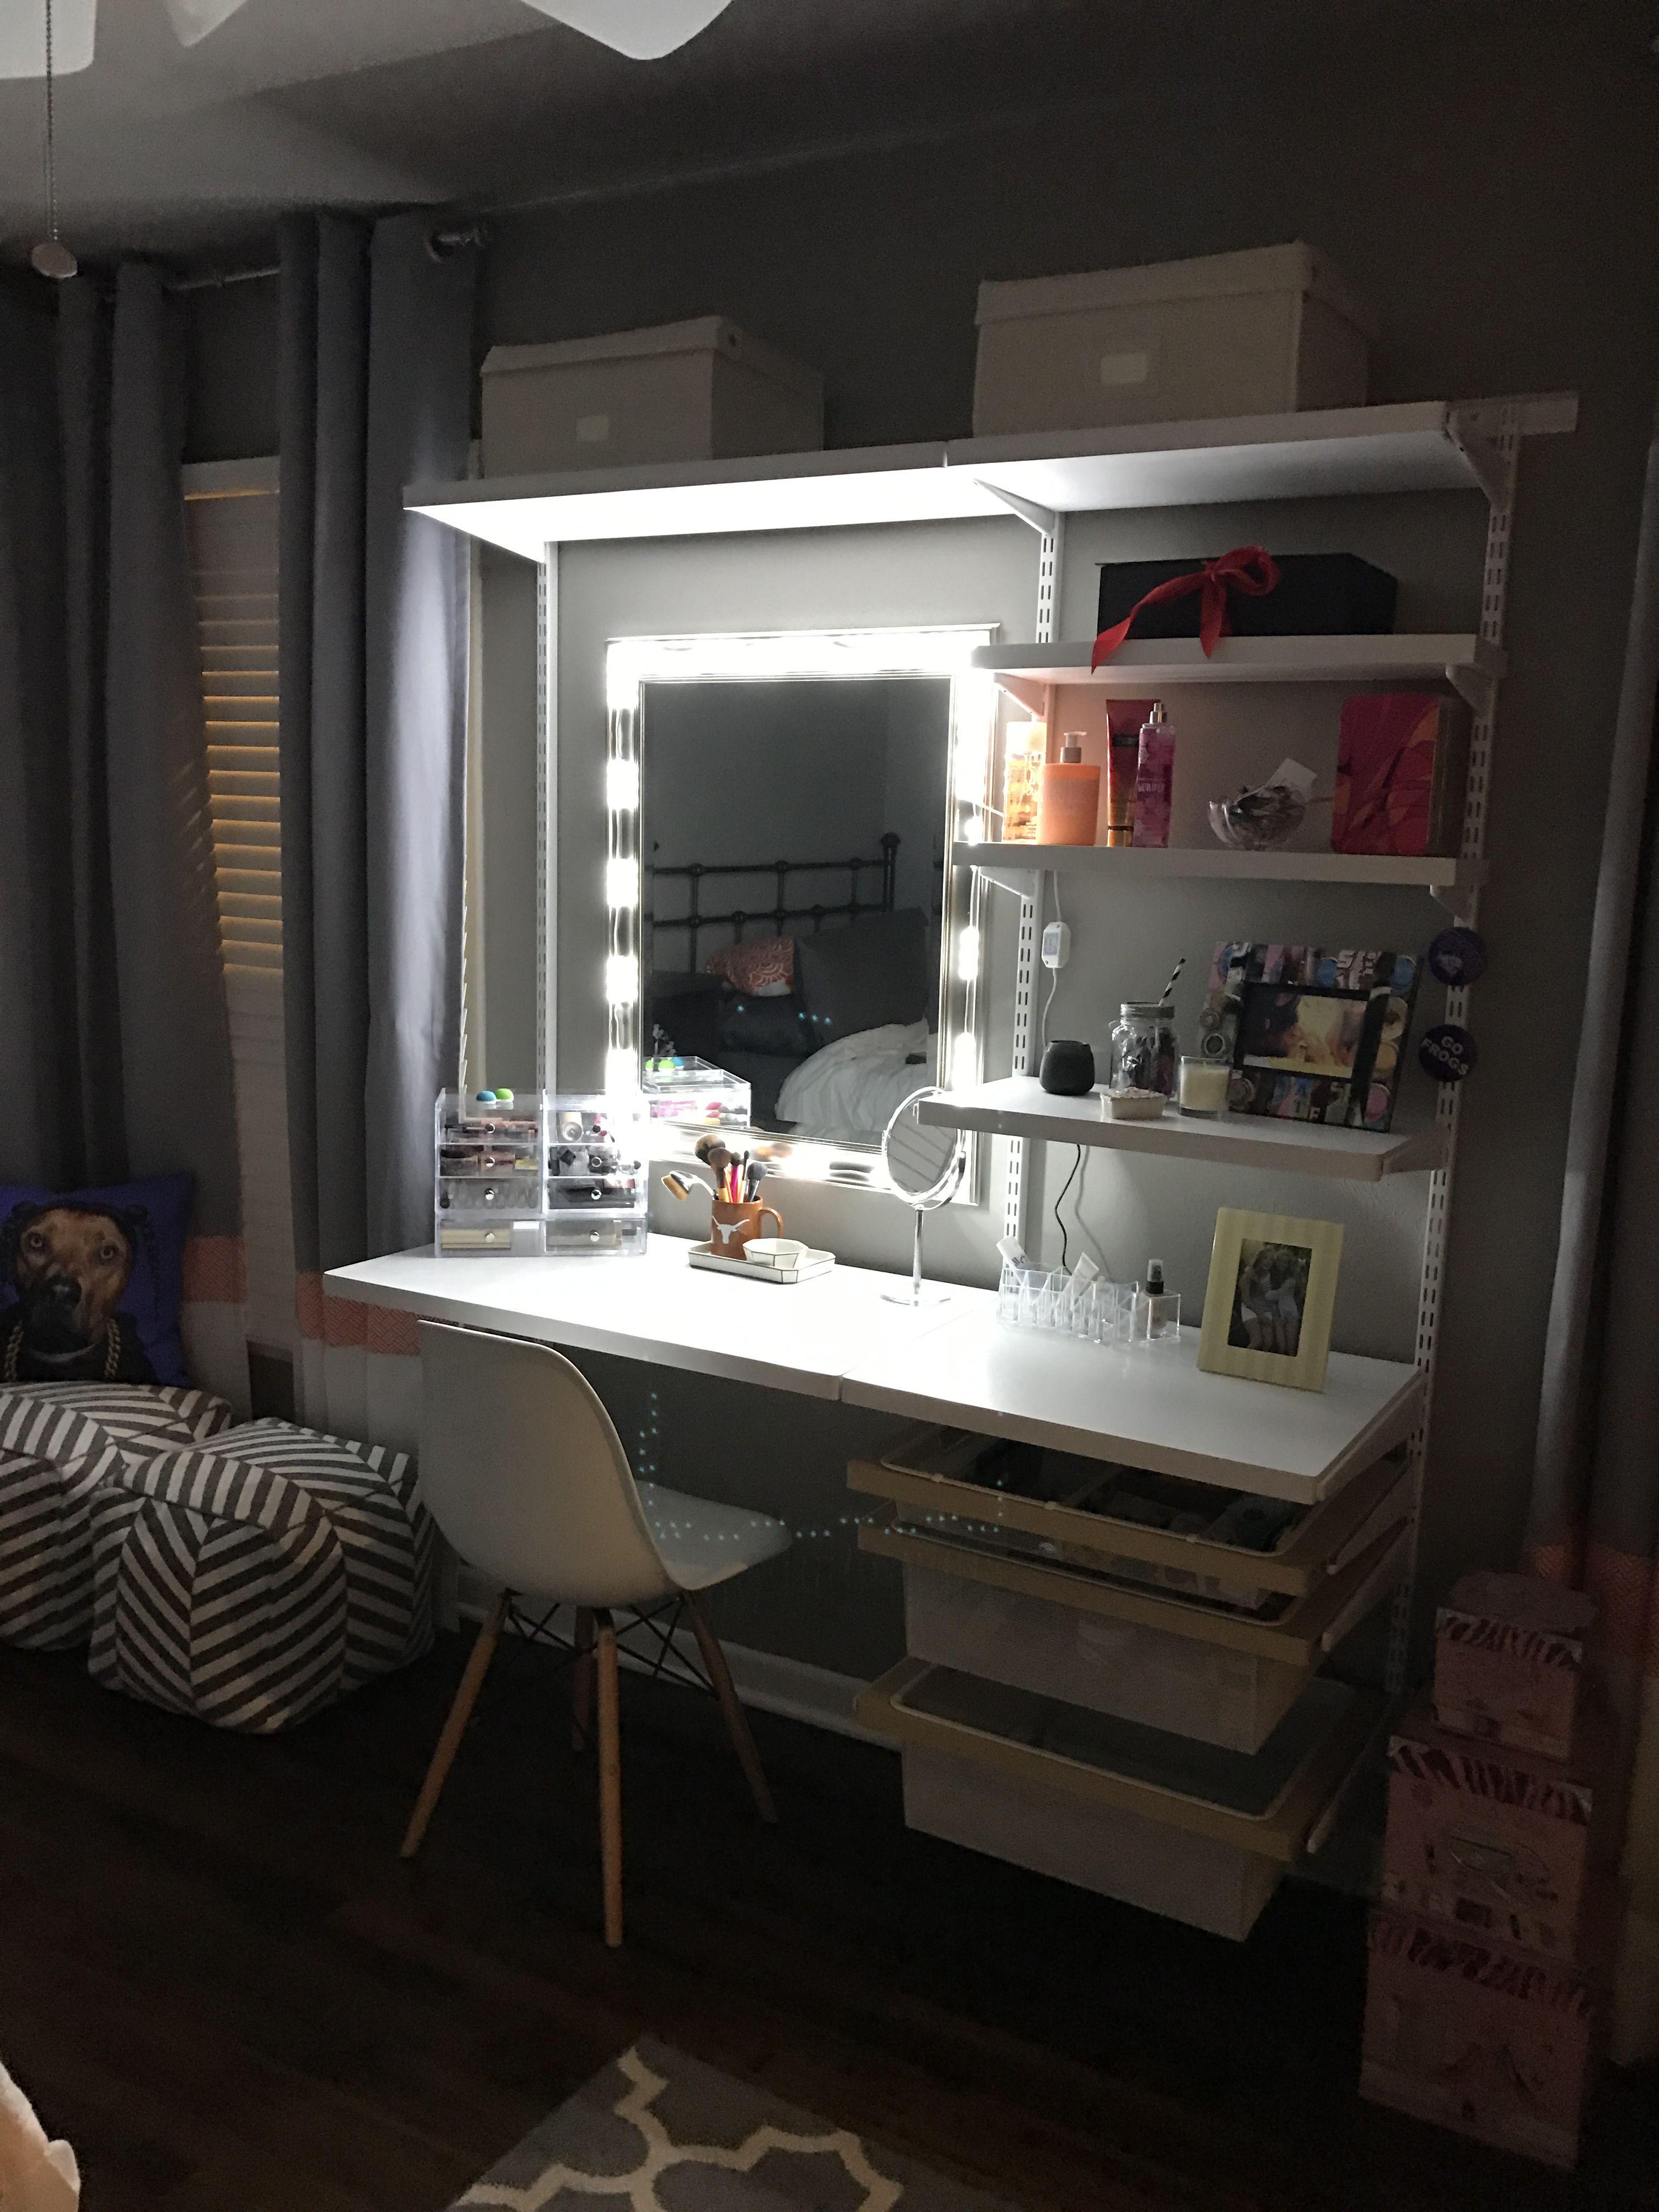 Makeup Vanity Elfa Container store. We already had the 24